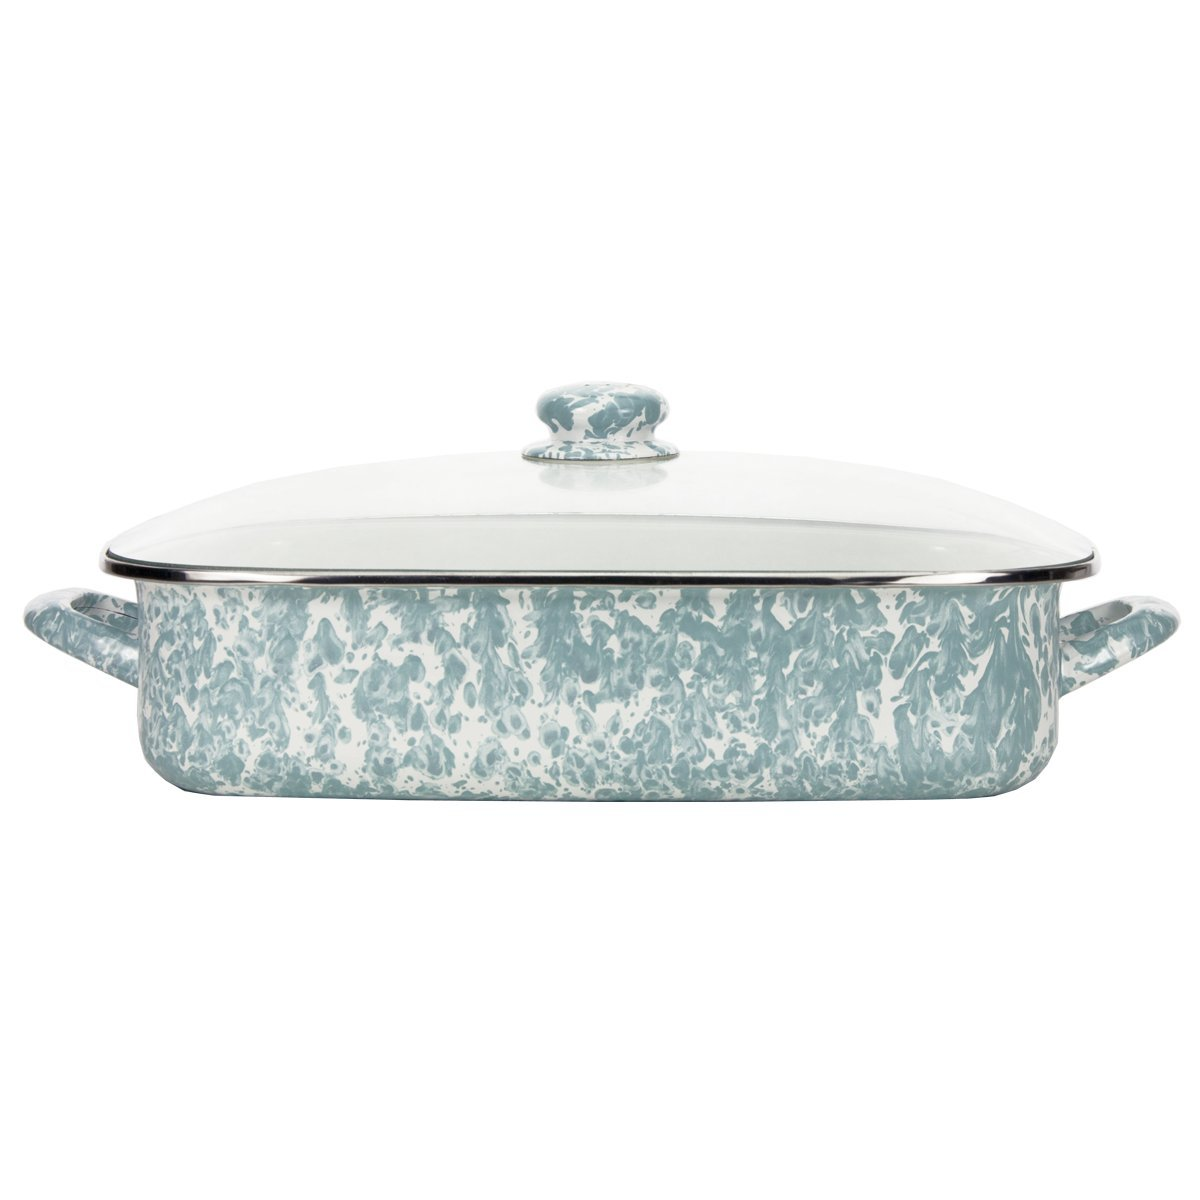 Enamelware -Sea Glass Teal Swirl Pattern -16 x 12.5 x 4 Inch Lasagna Pan Set